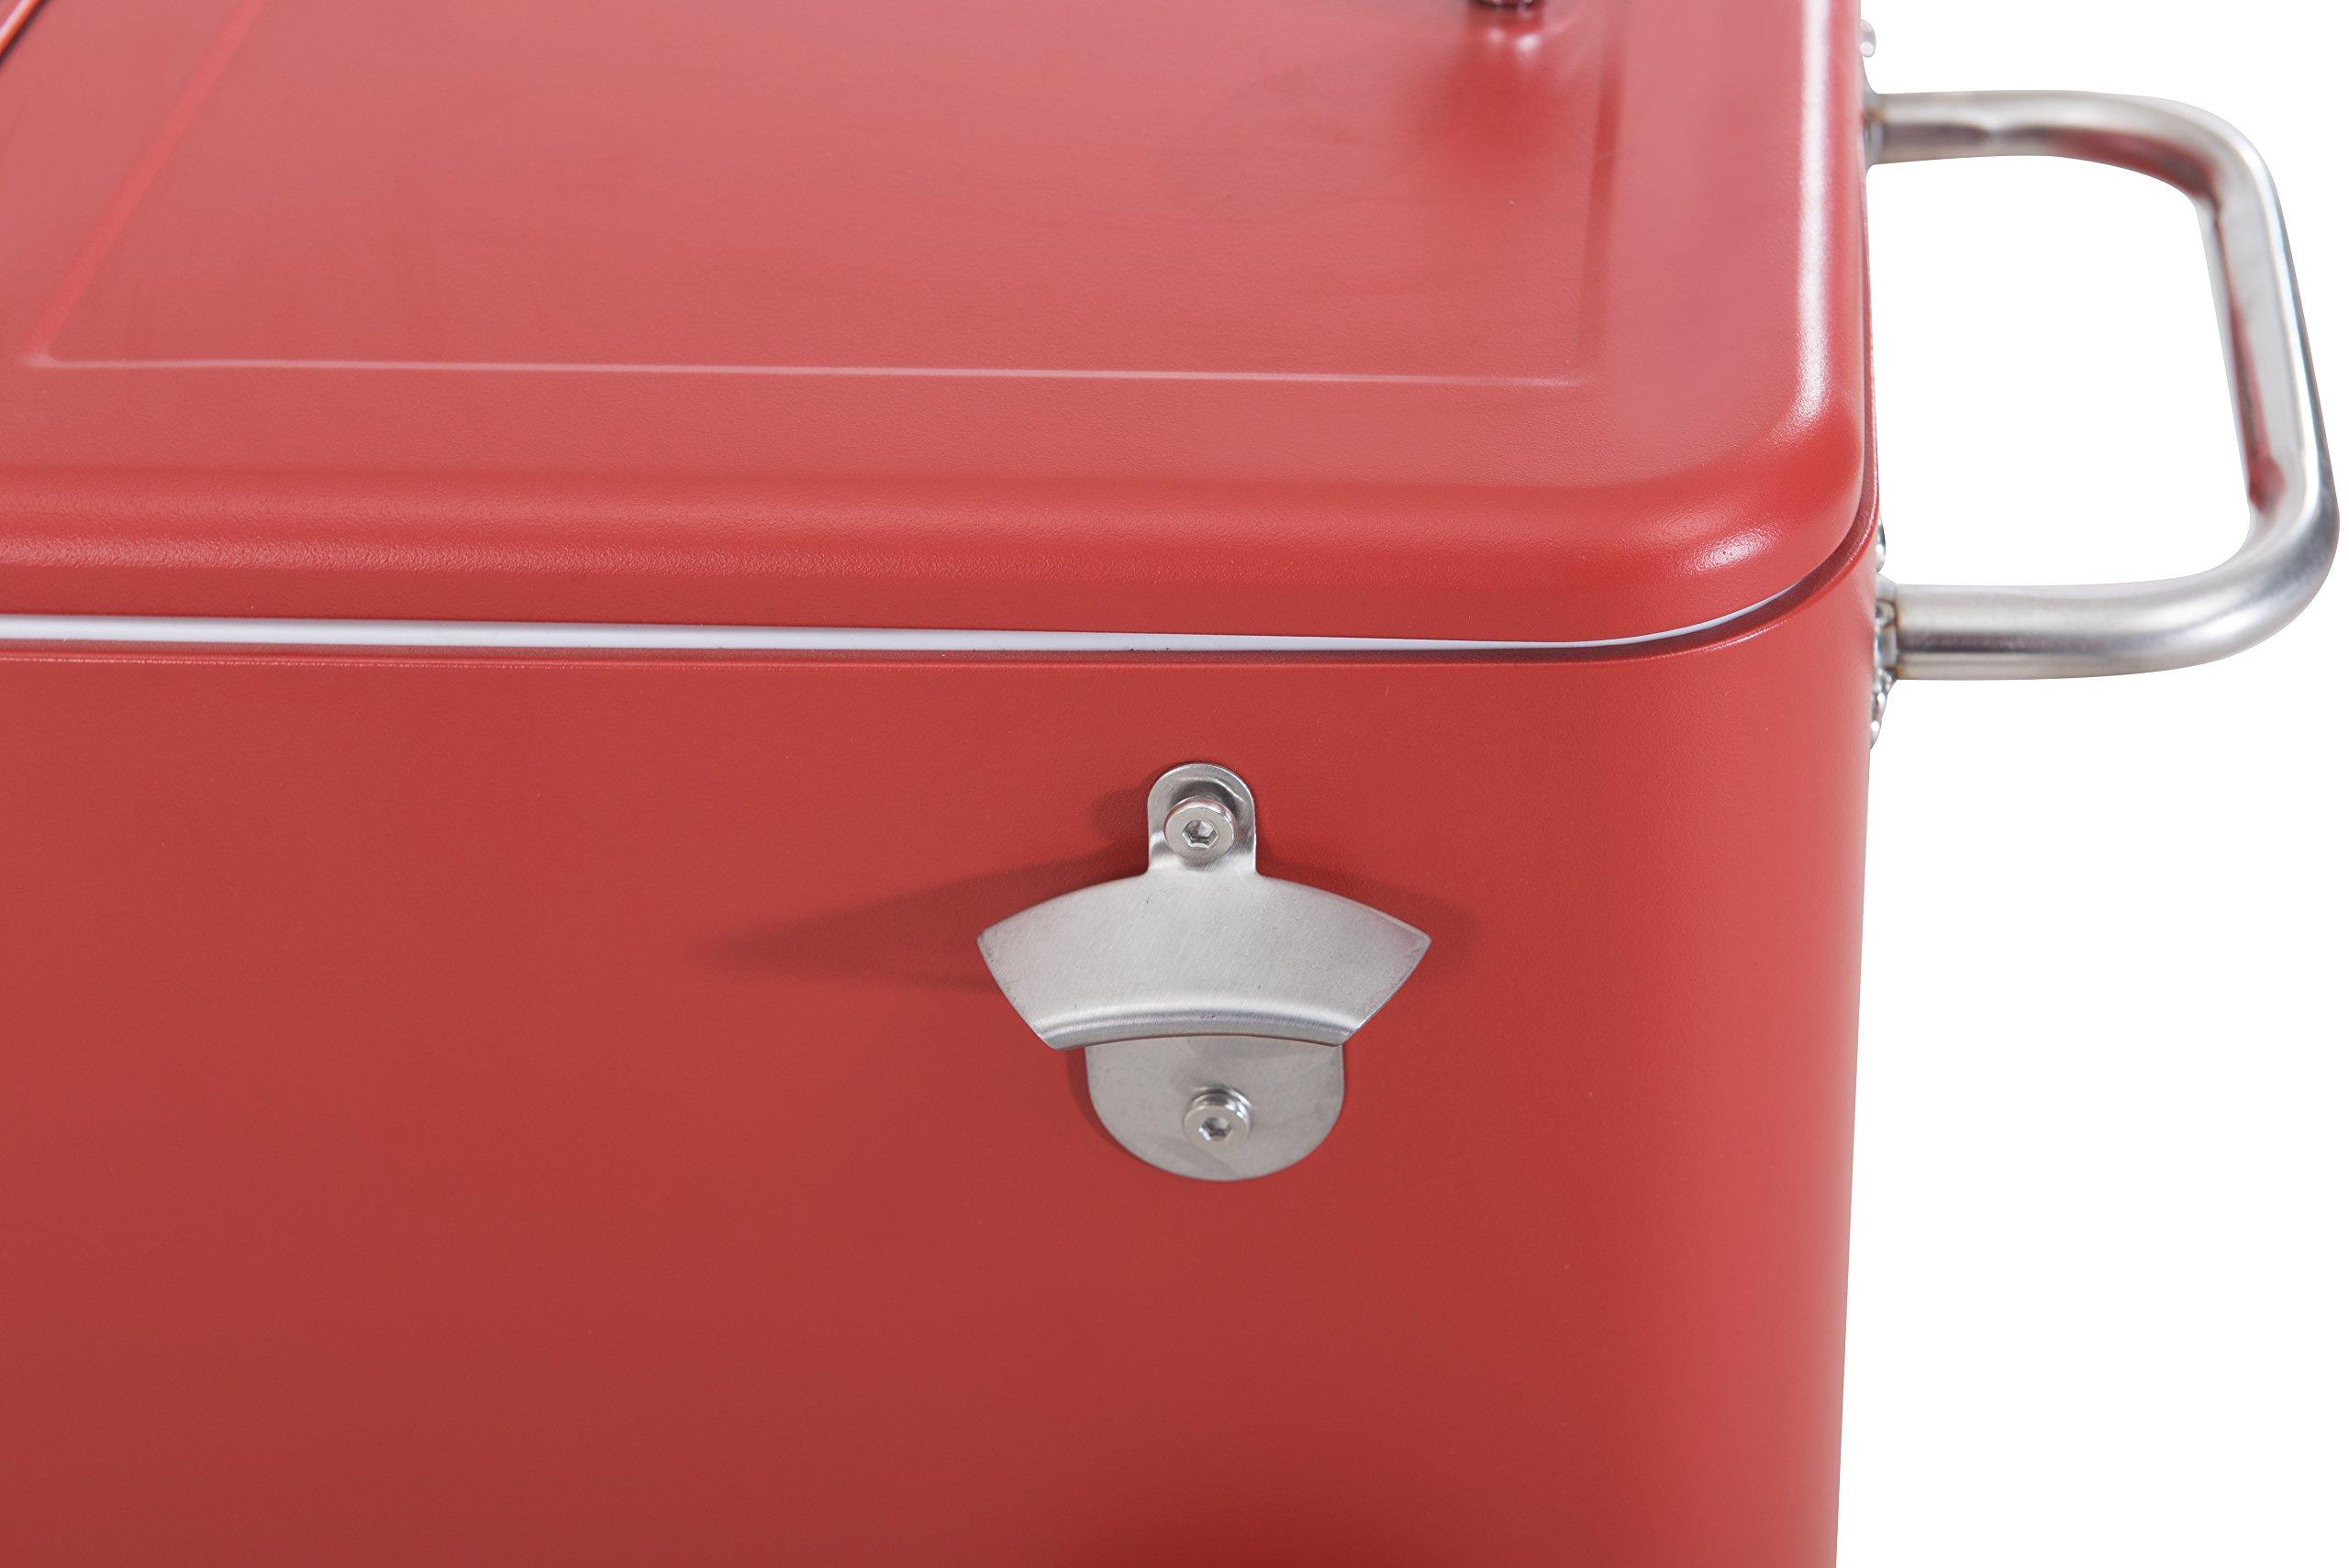 Sunjoy L-BC153PST 60 quart Wheeled Beverage Cooler in Red by sunjoy (Image #7)